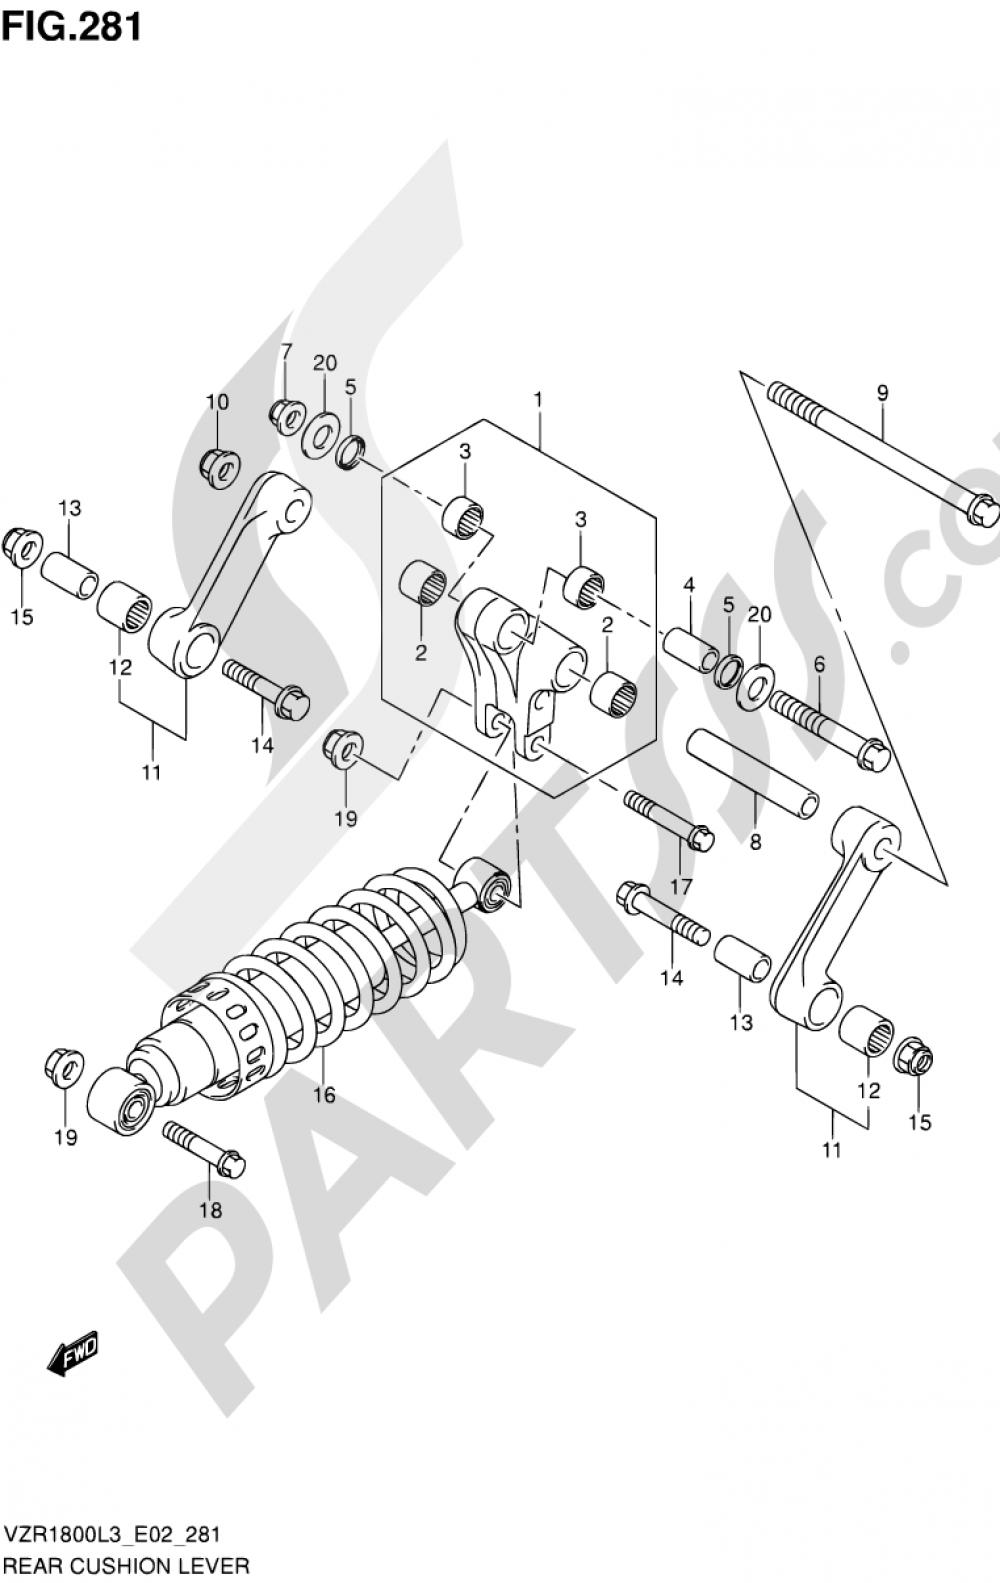 281 - REAR CUSHION LEVER (VZR1800ZL3 E24) Suzuki VZR1800Z 2013